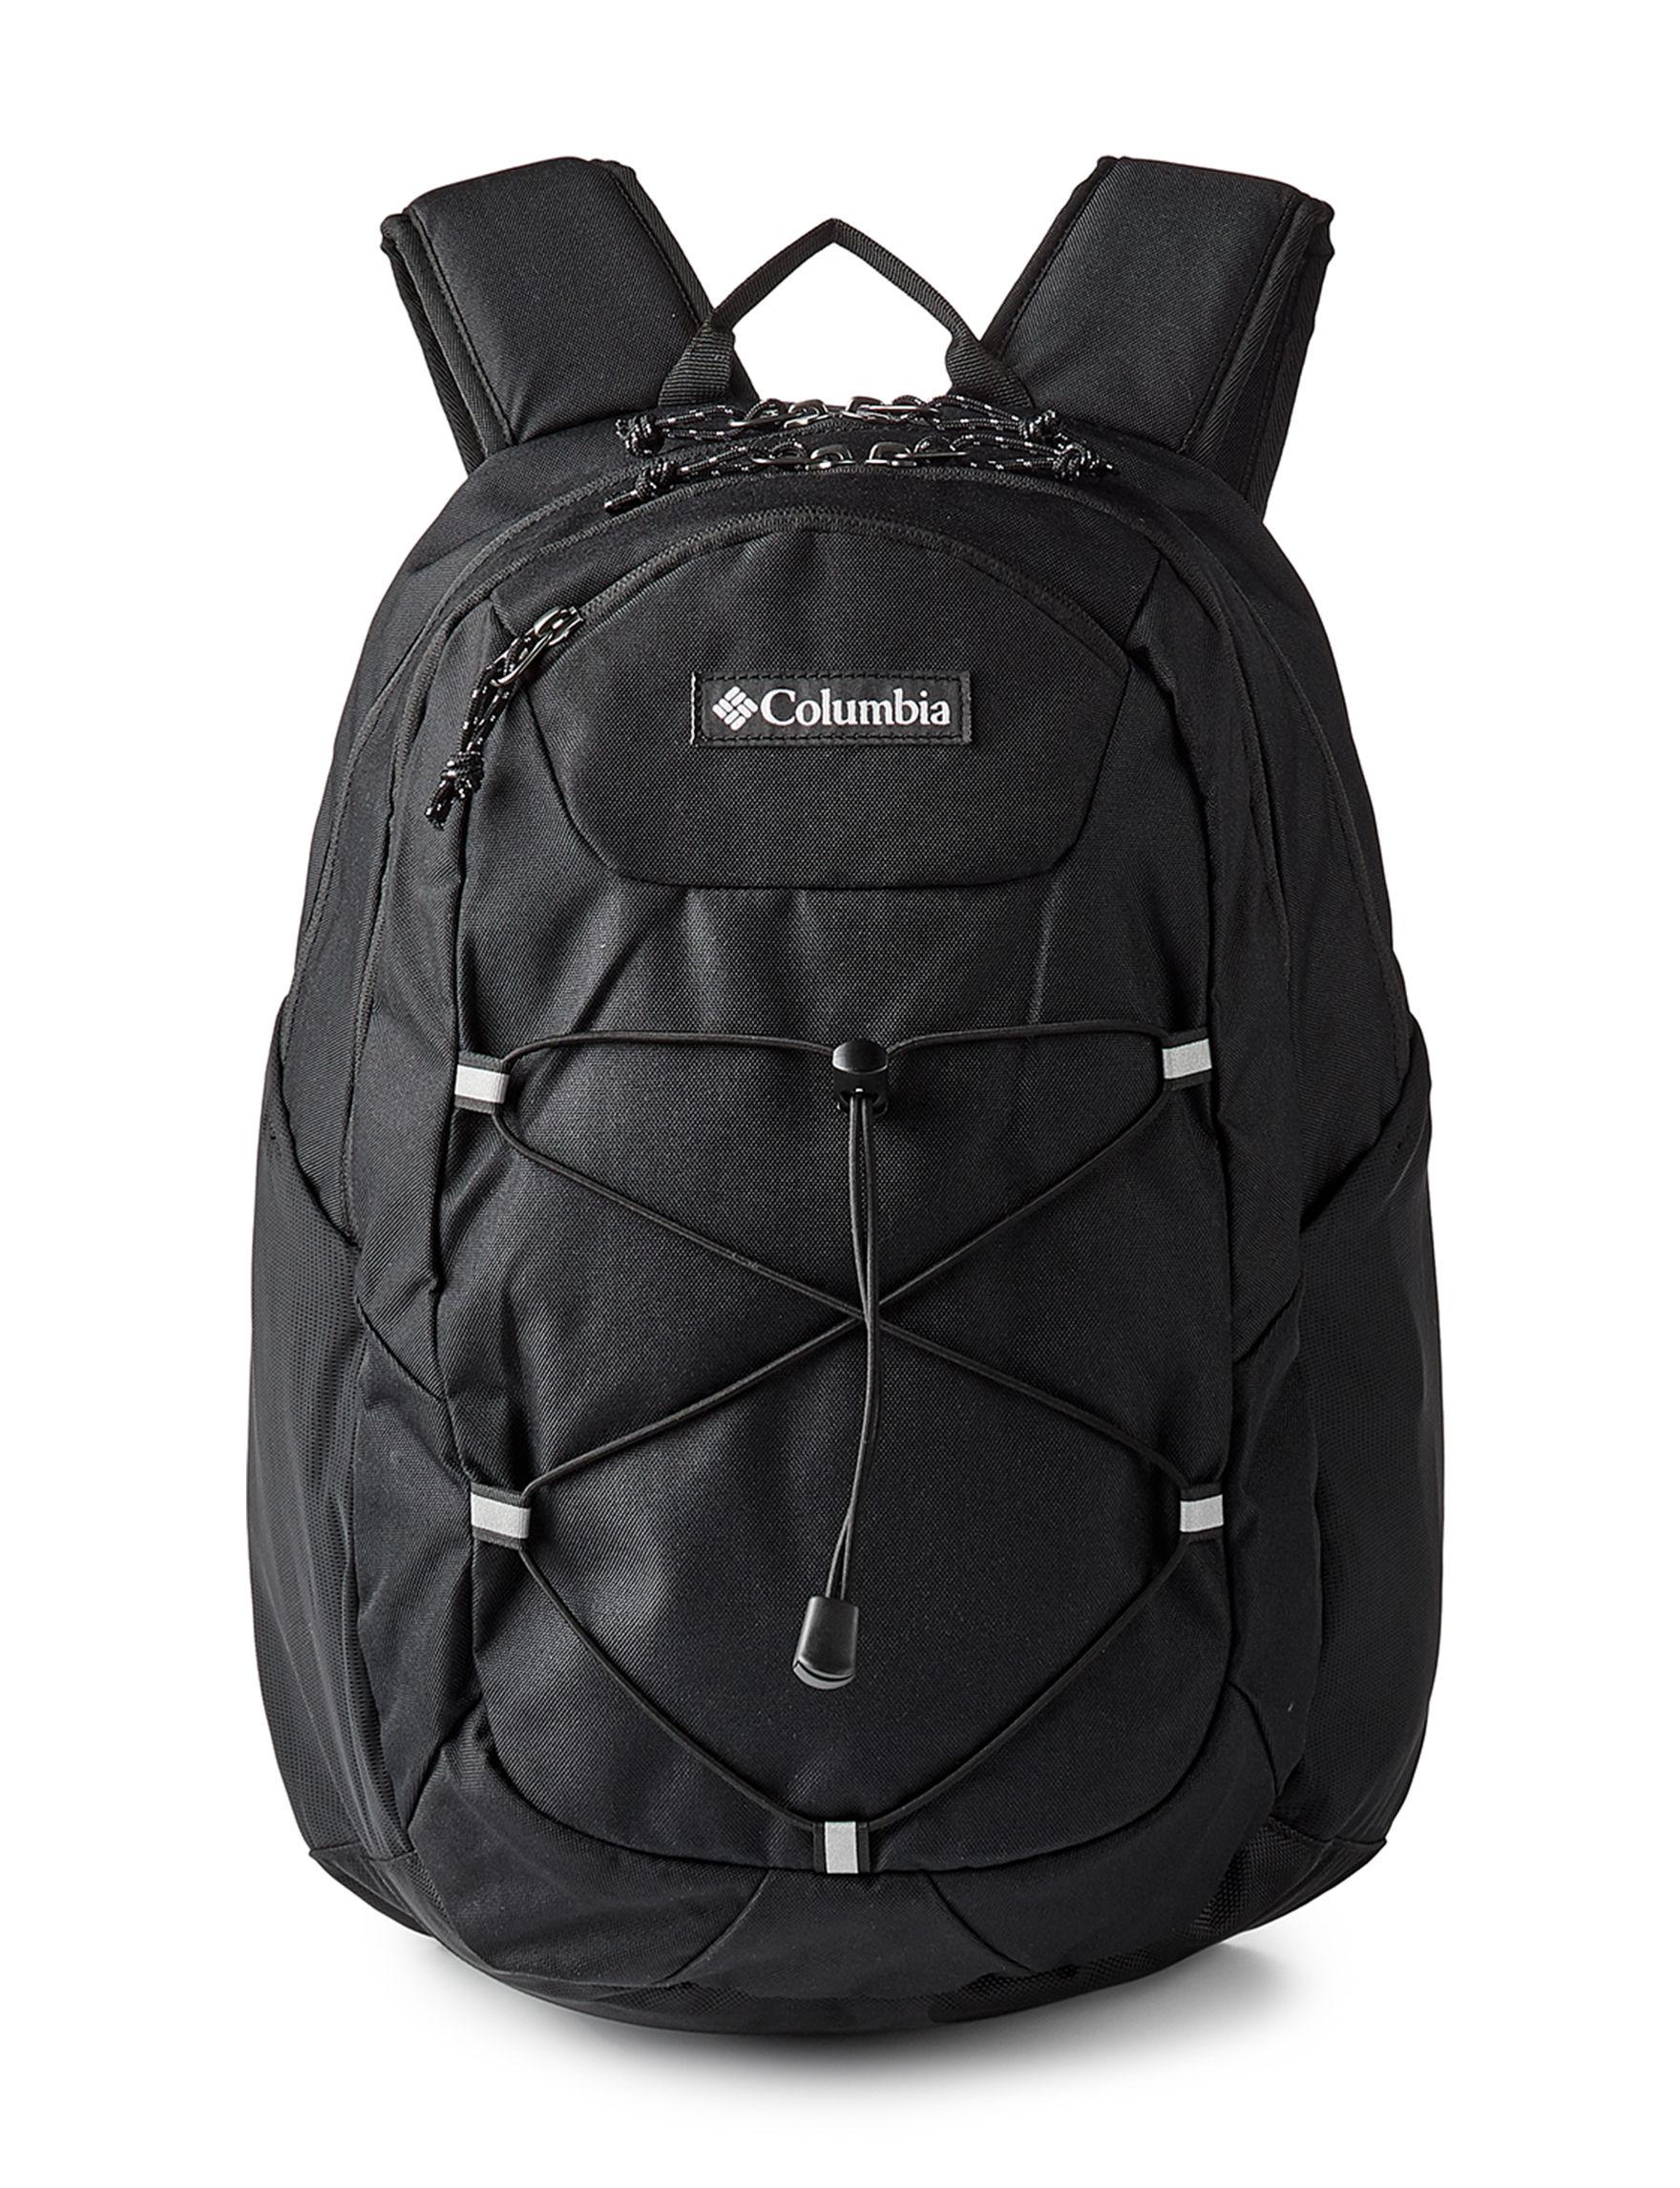 Columbia Black Bookbags & Backpacks